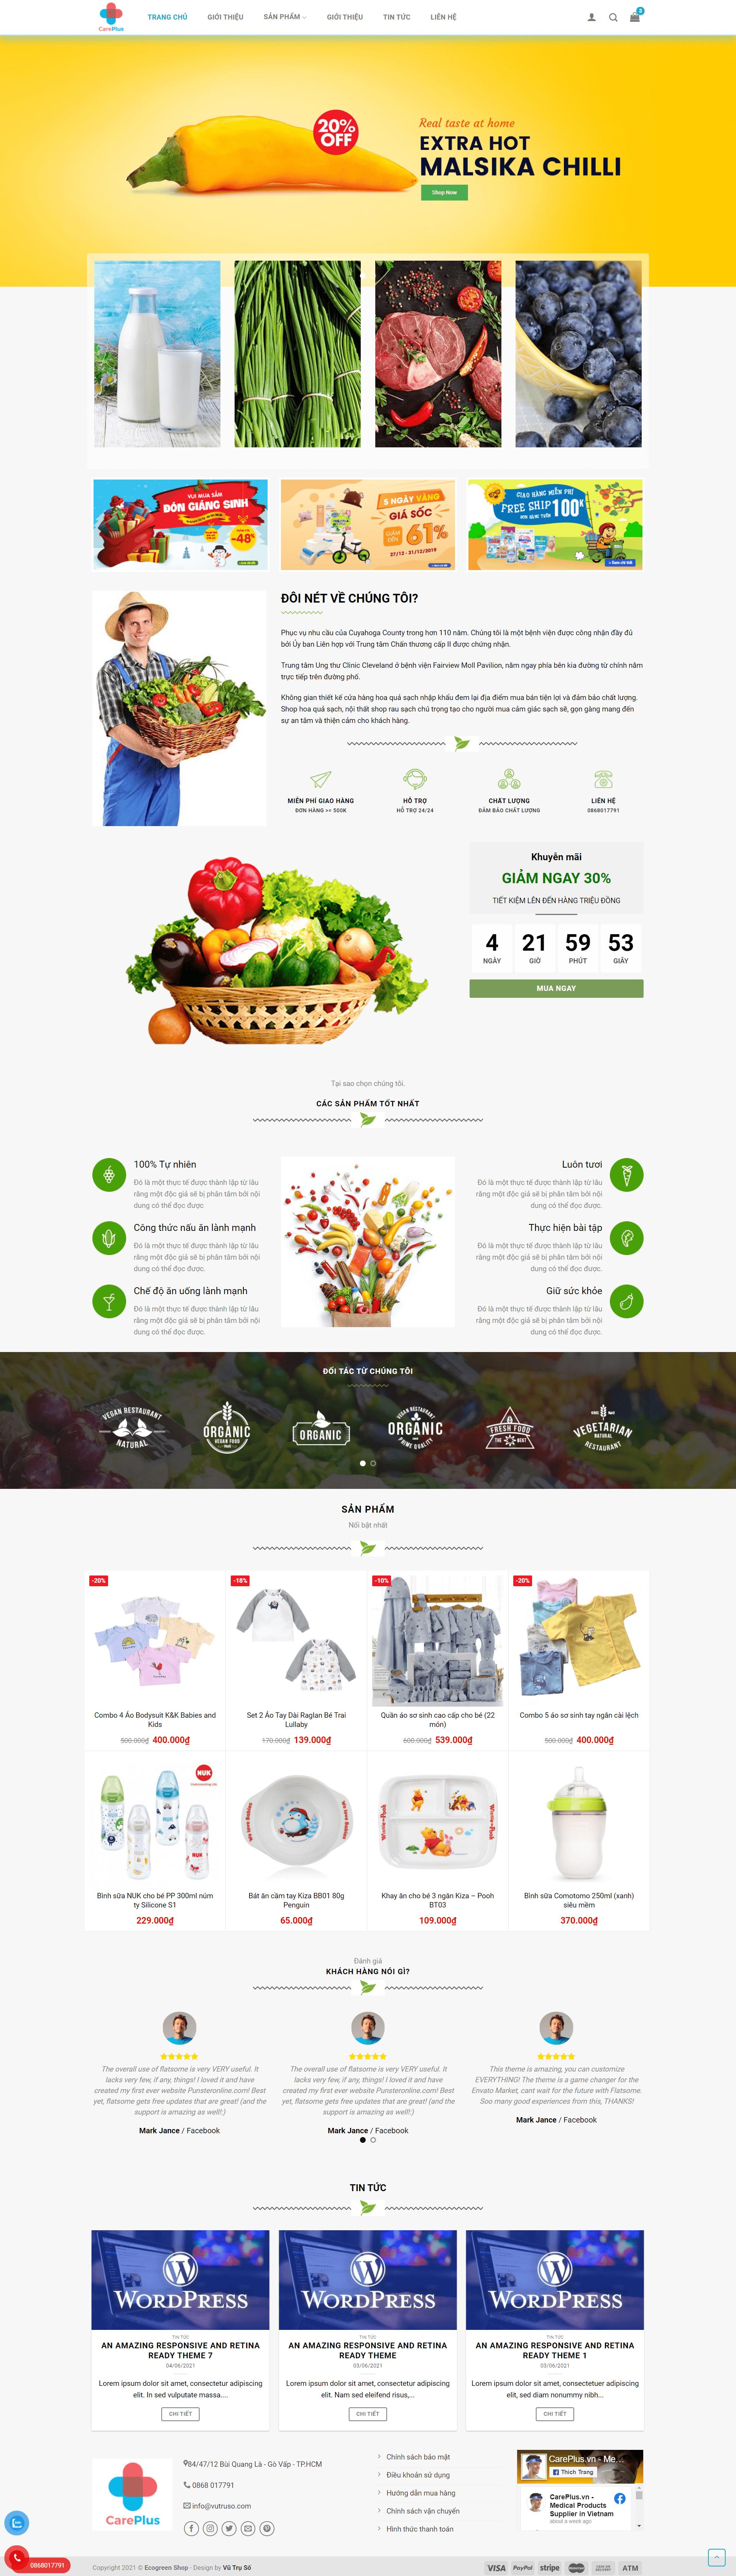 Mẫu website bán thực phẩm online – Careplus